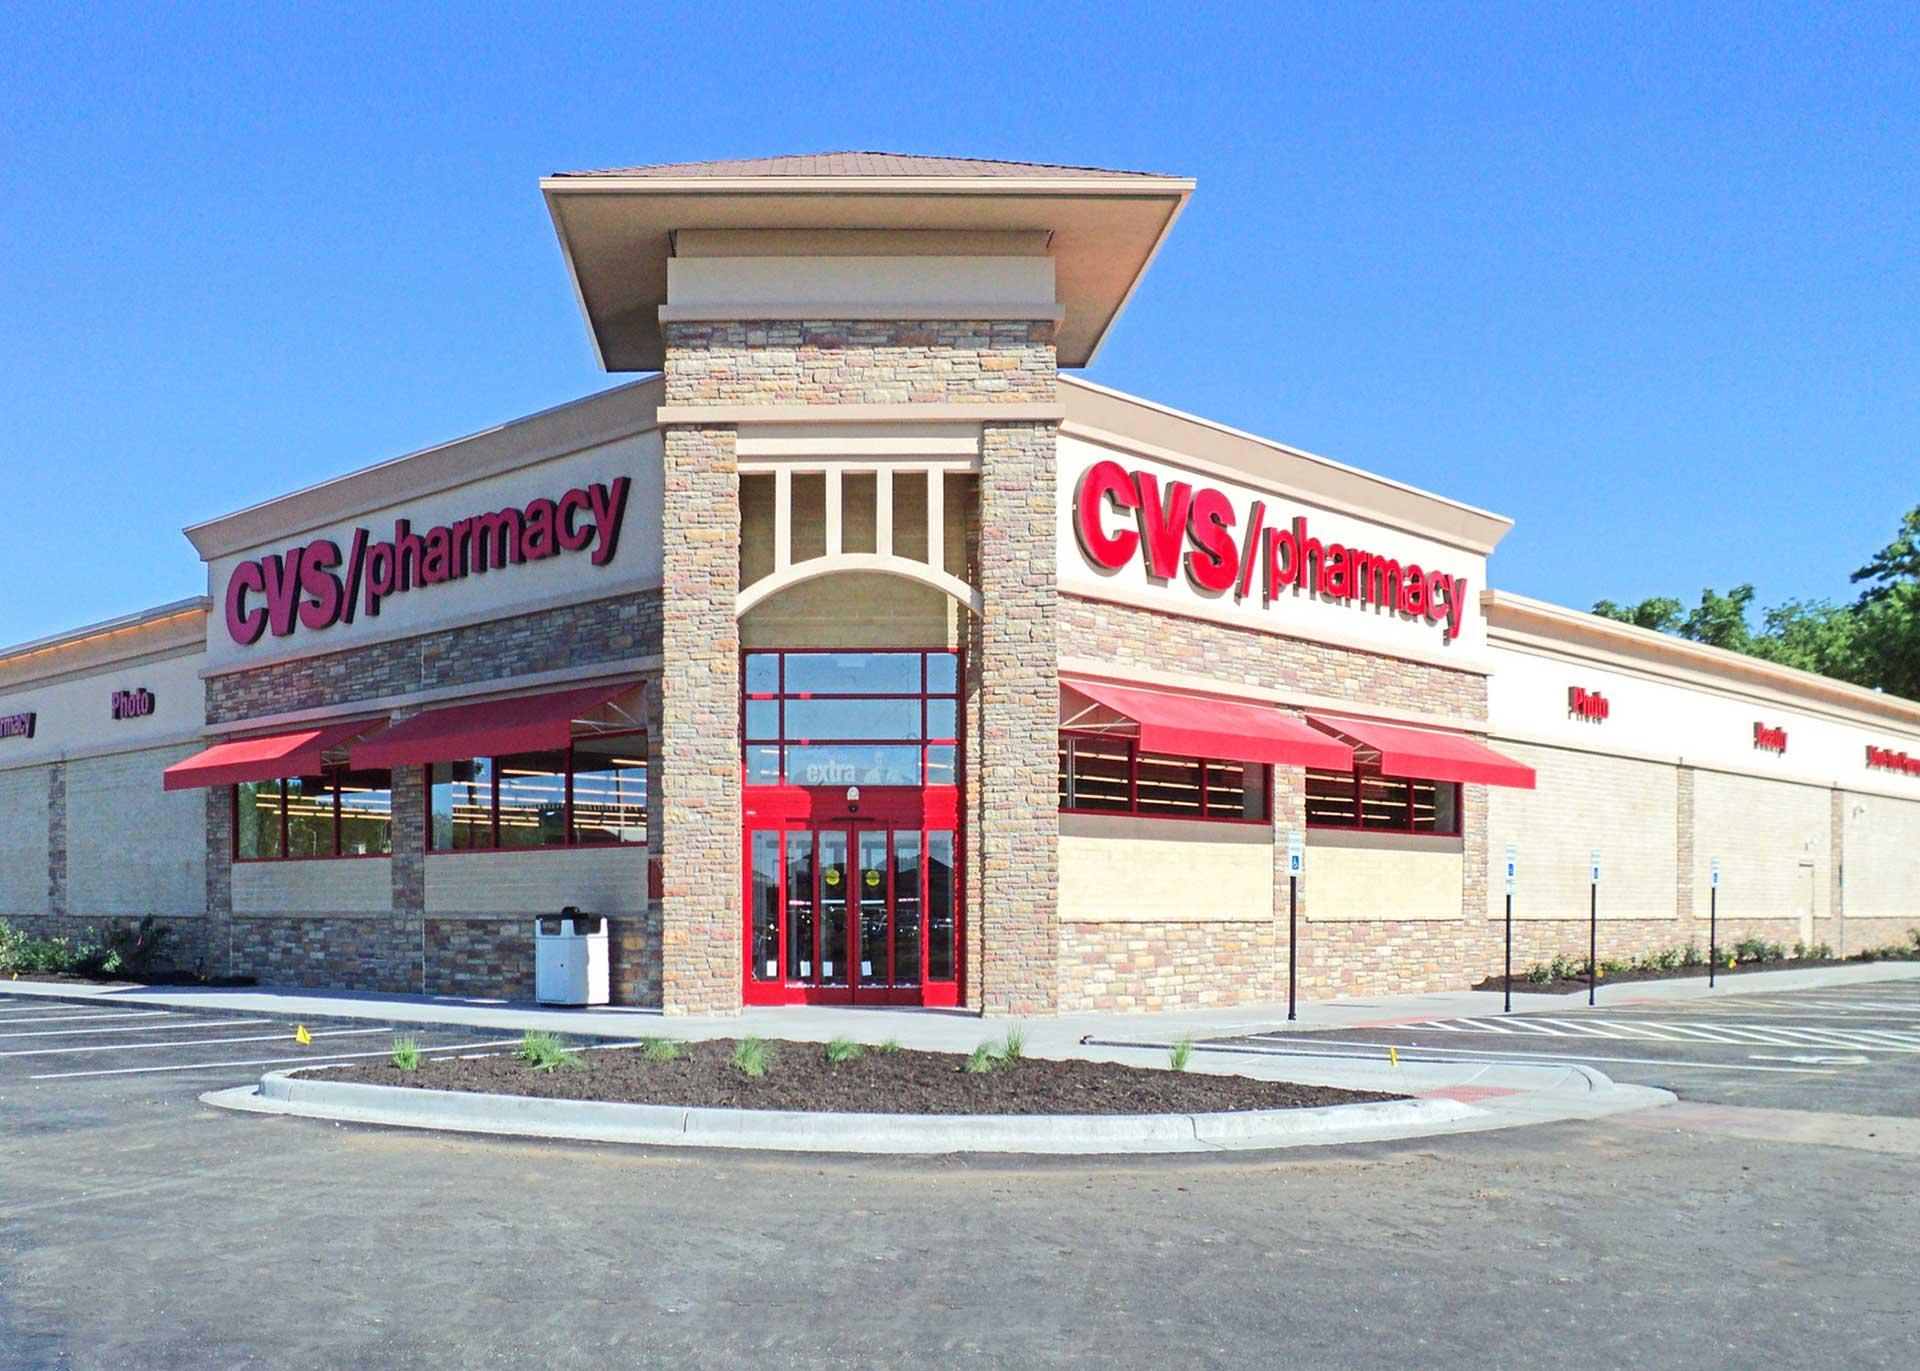 CVS Pharmacy in Olathe, Kansas